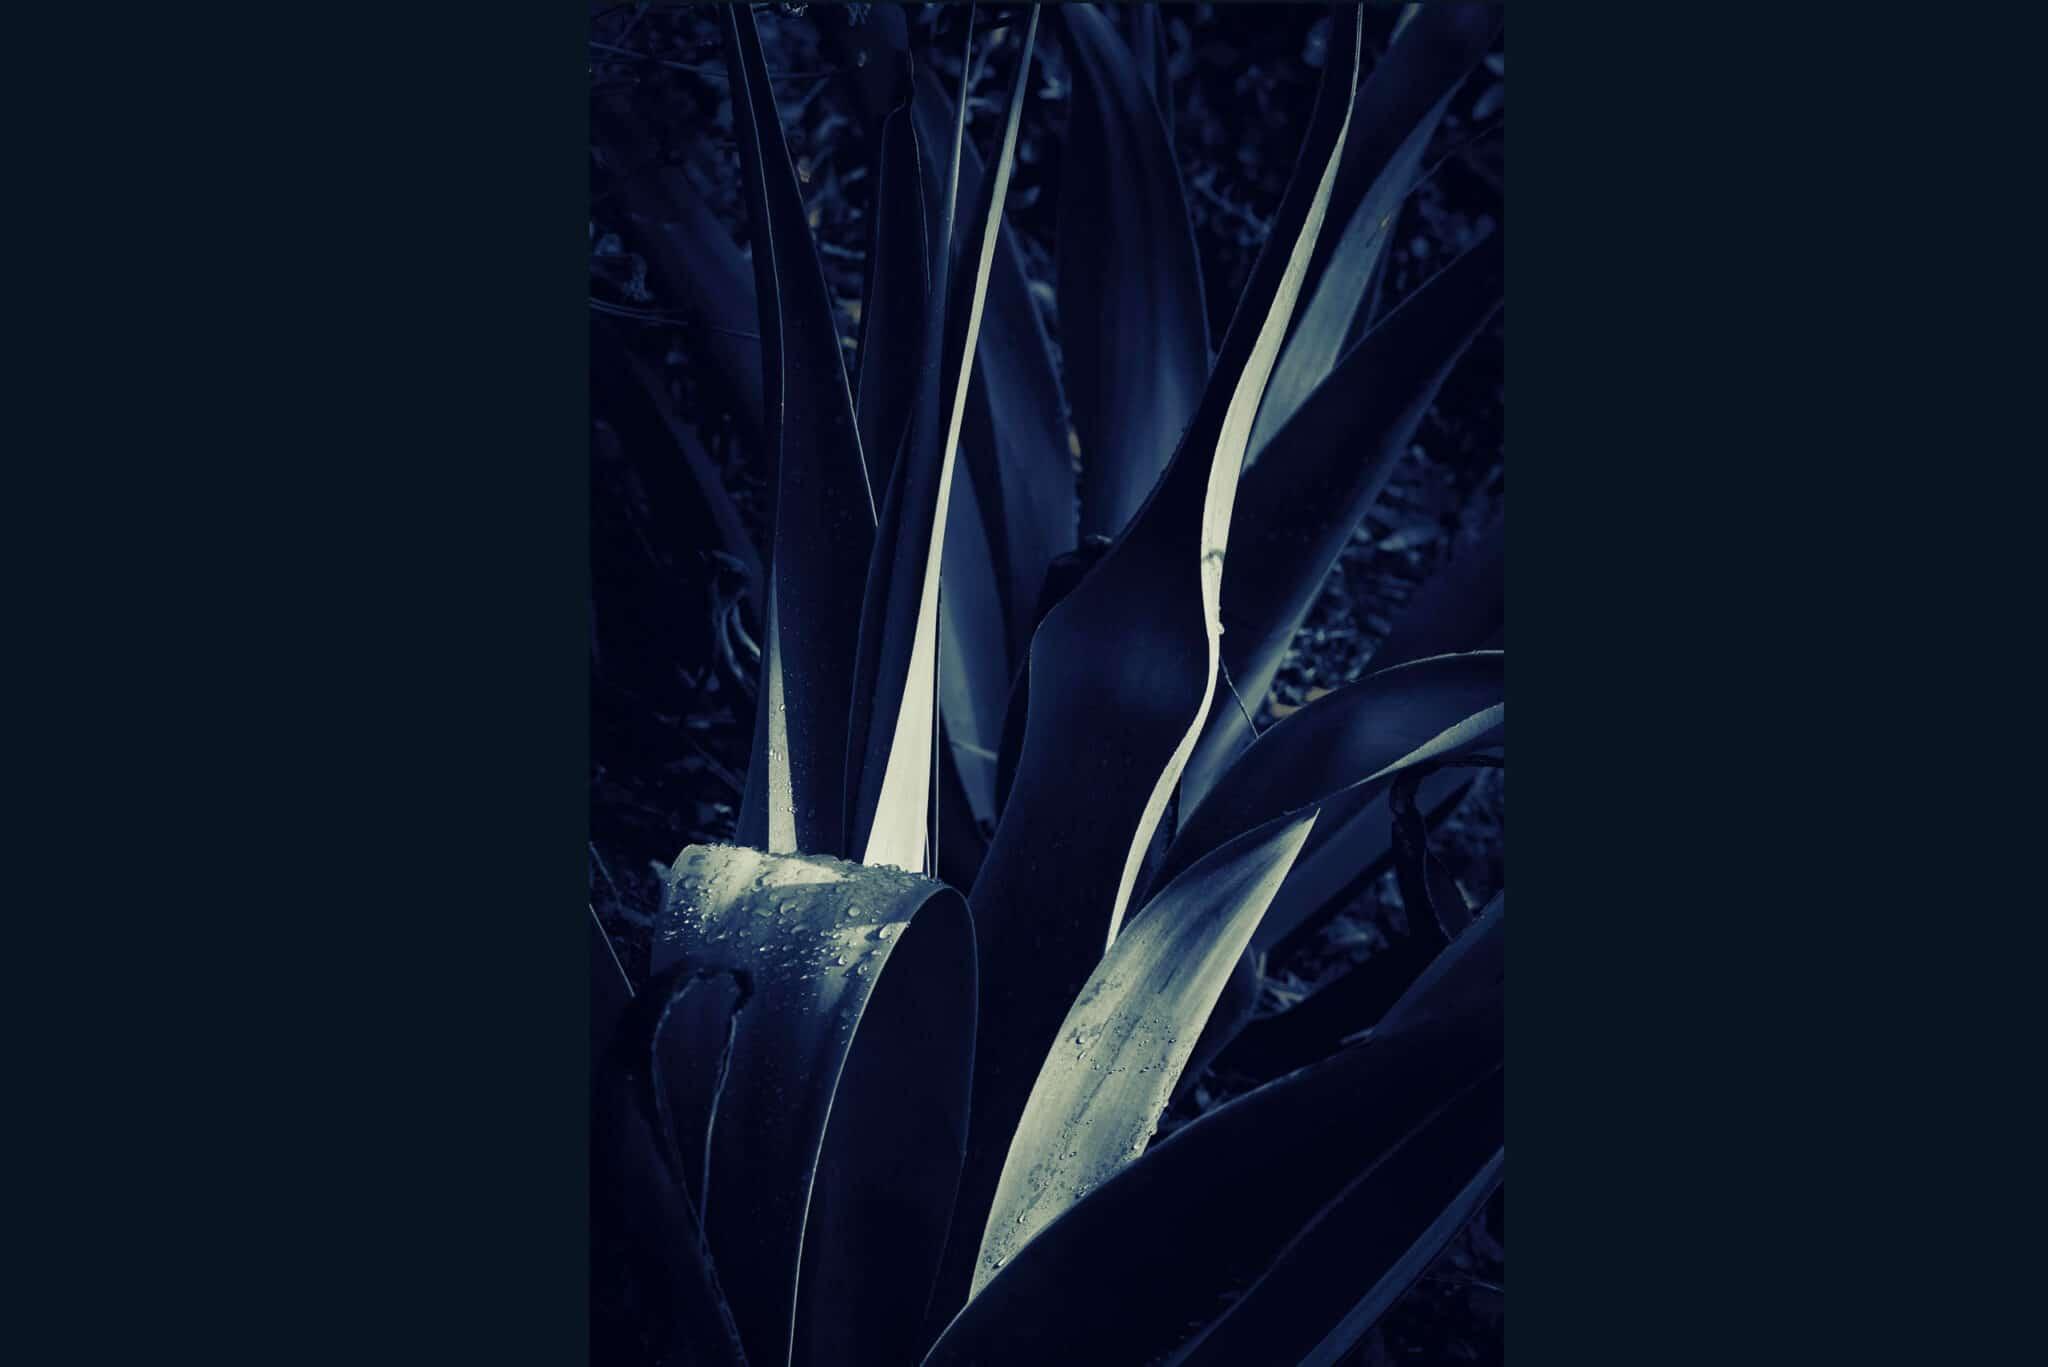 Lev L Spiro - Fugitive Light